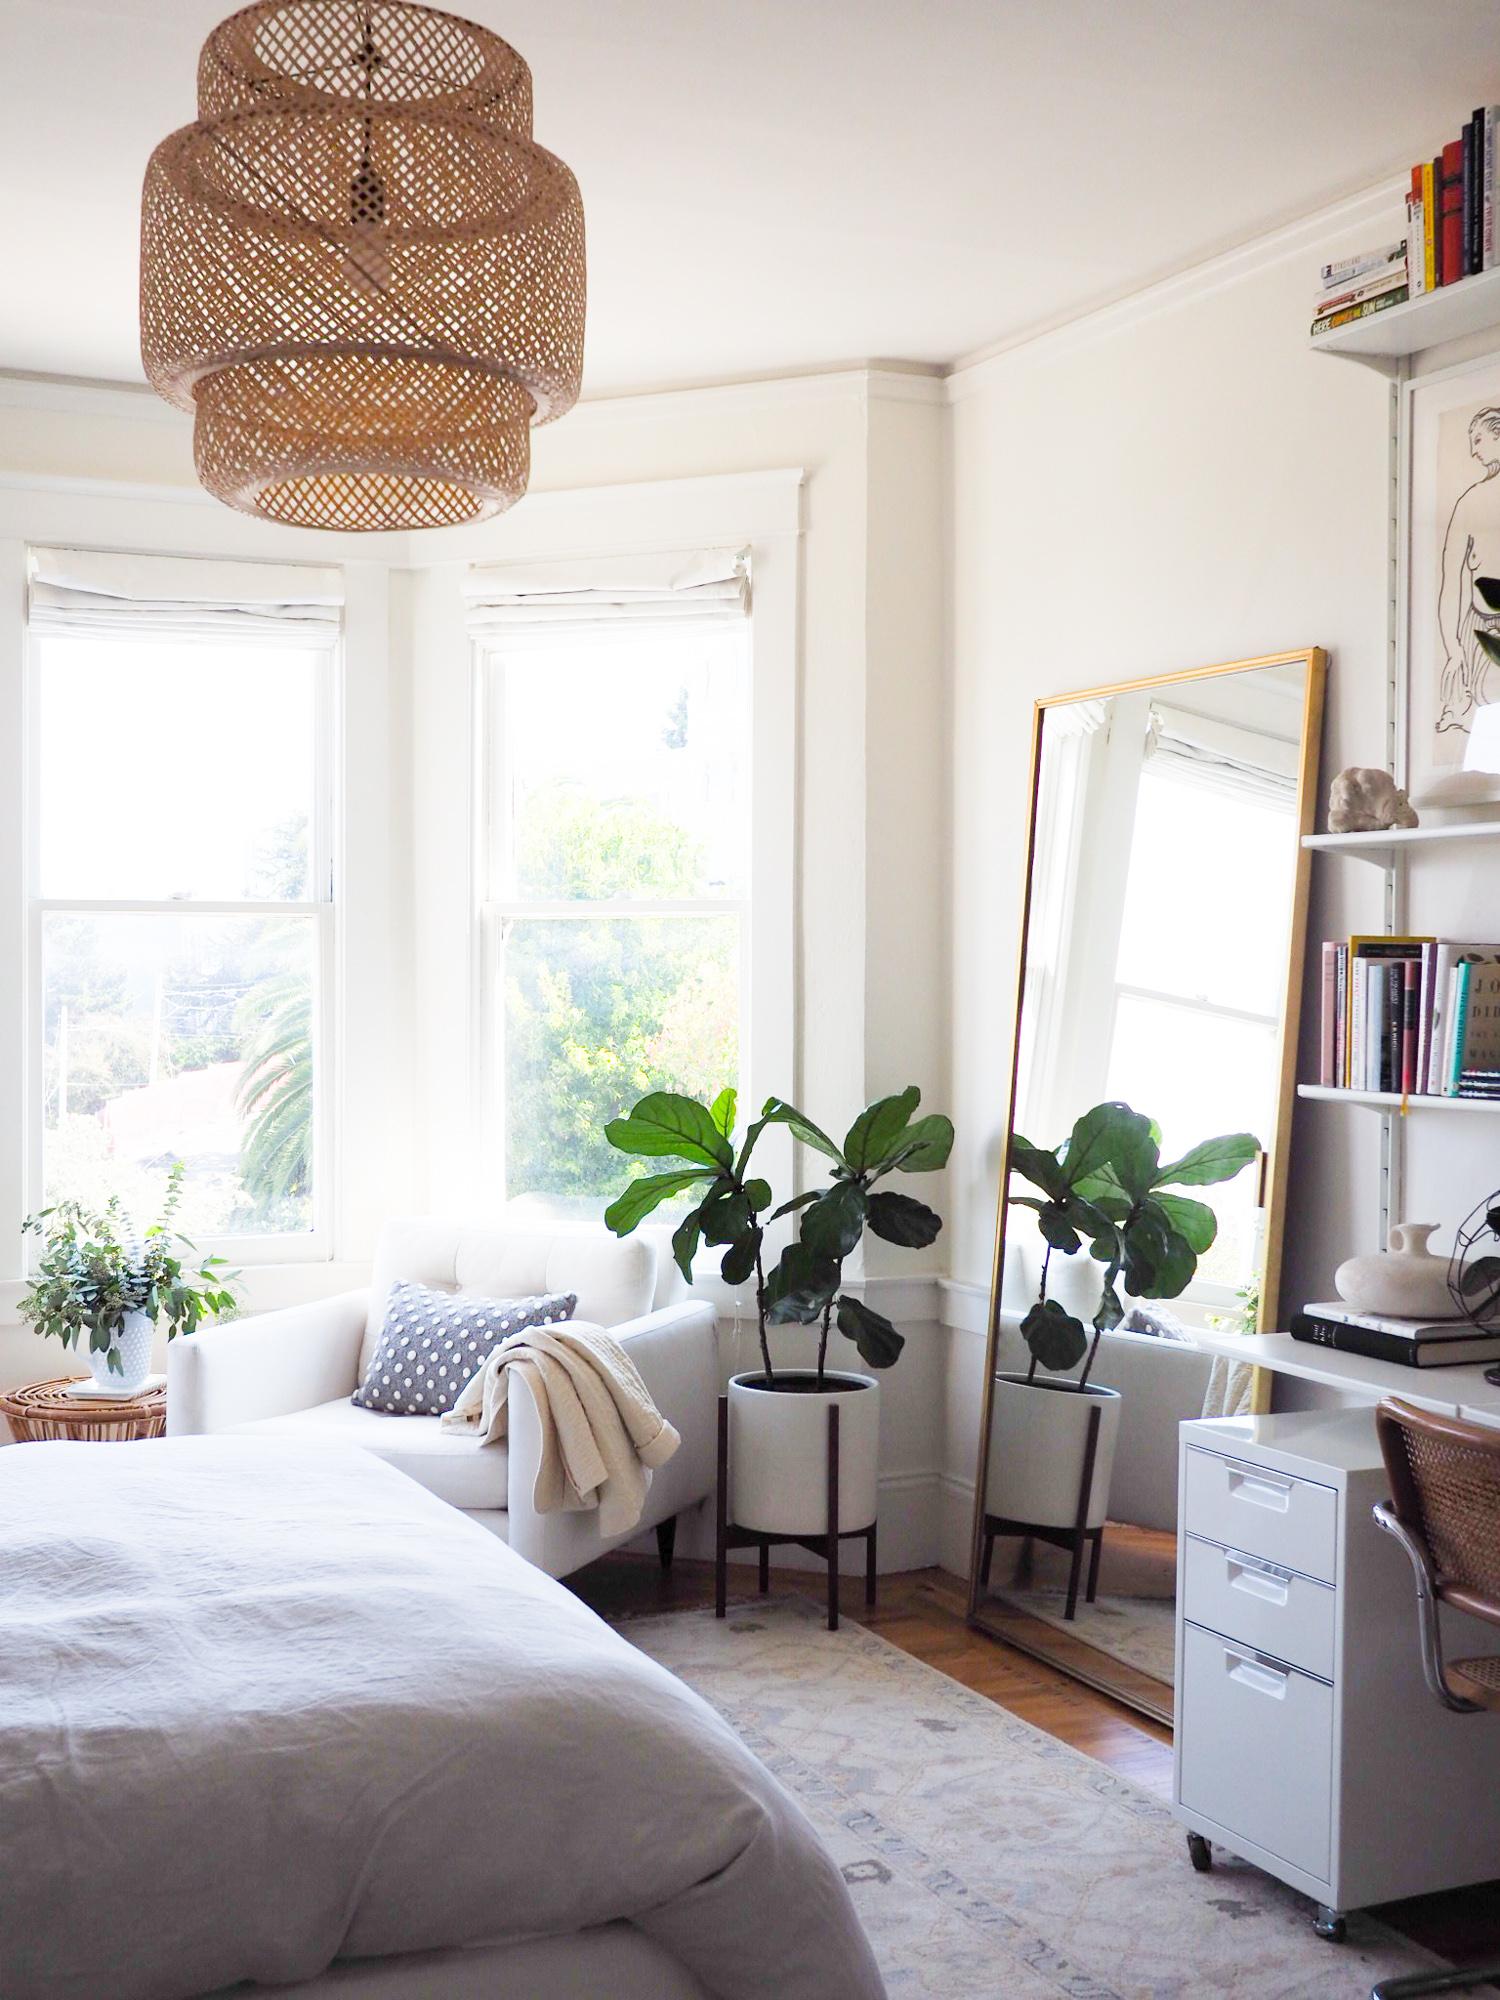 My Home Tour: The Bedroom — Eliza Kern Design